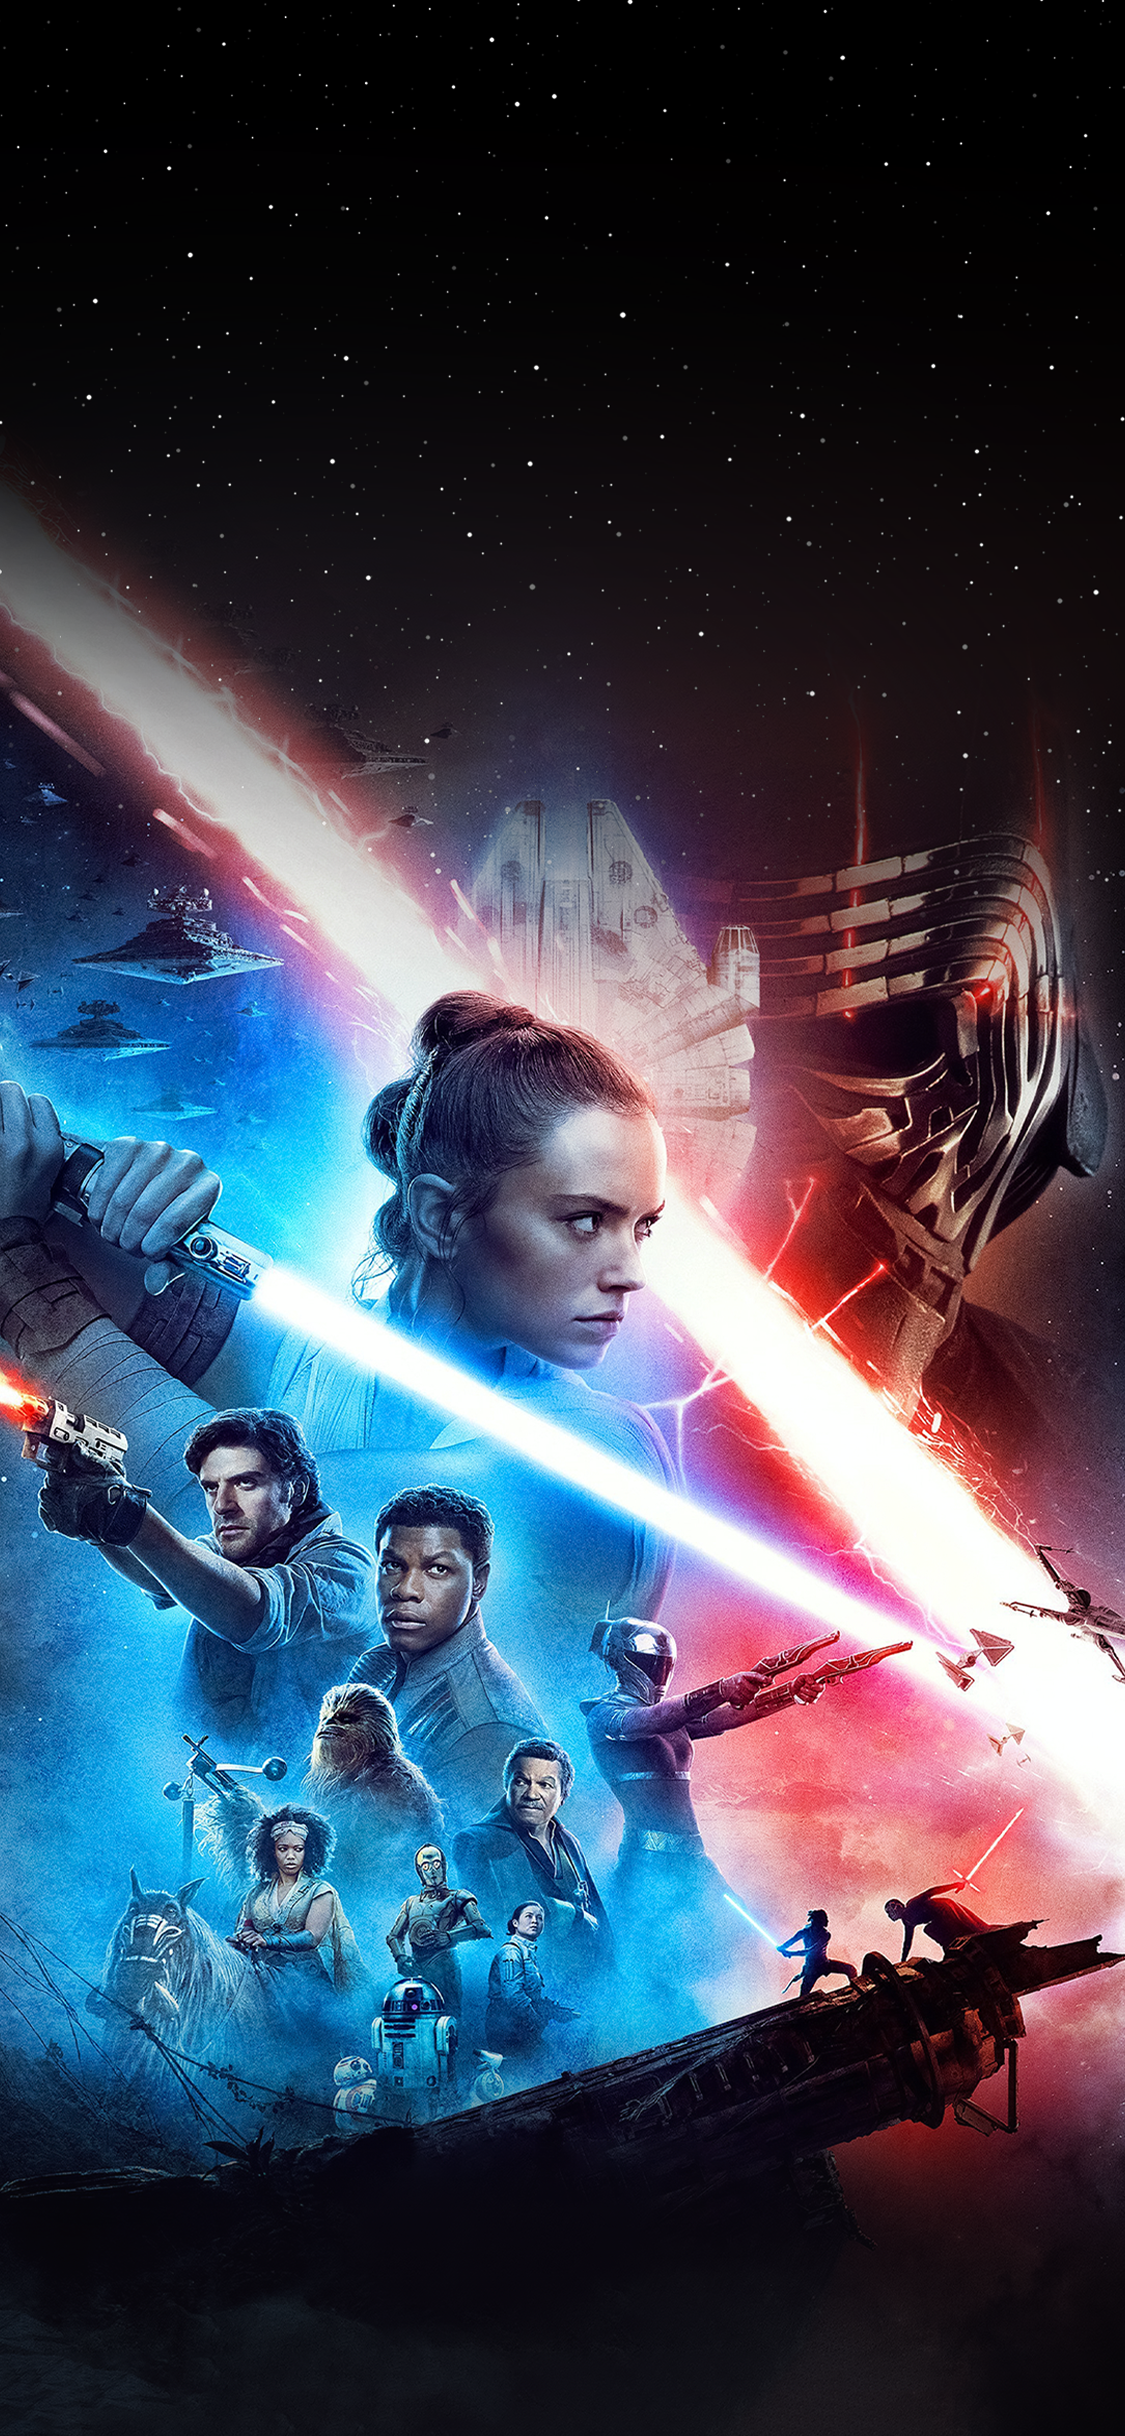 Star Wars The Rise Of Skywalker Movie Poster 1108x2400 Download Hd Wallpaper Wallpapertip